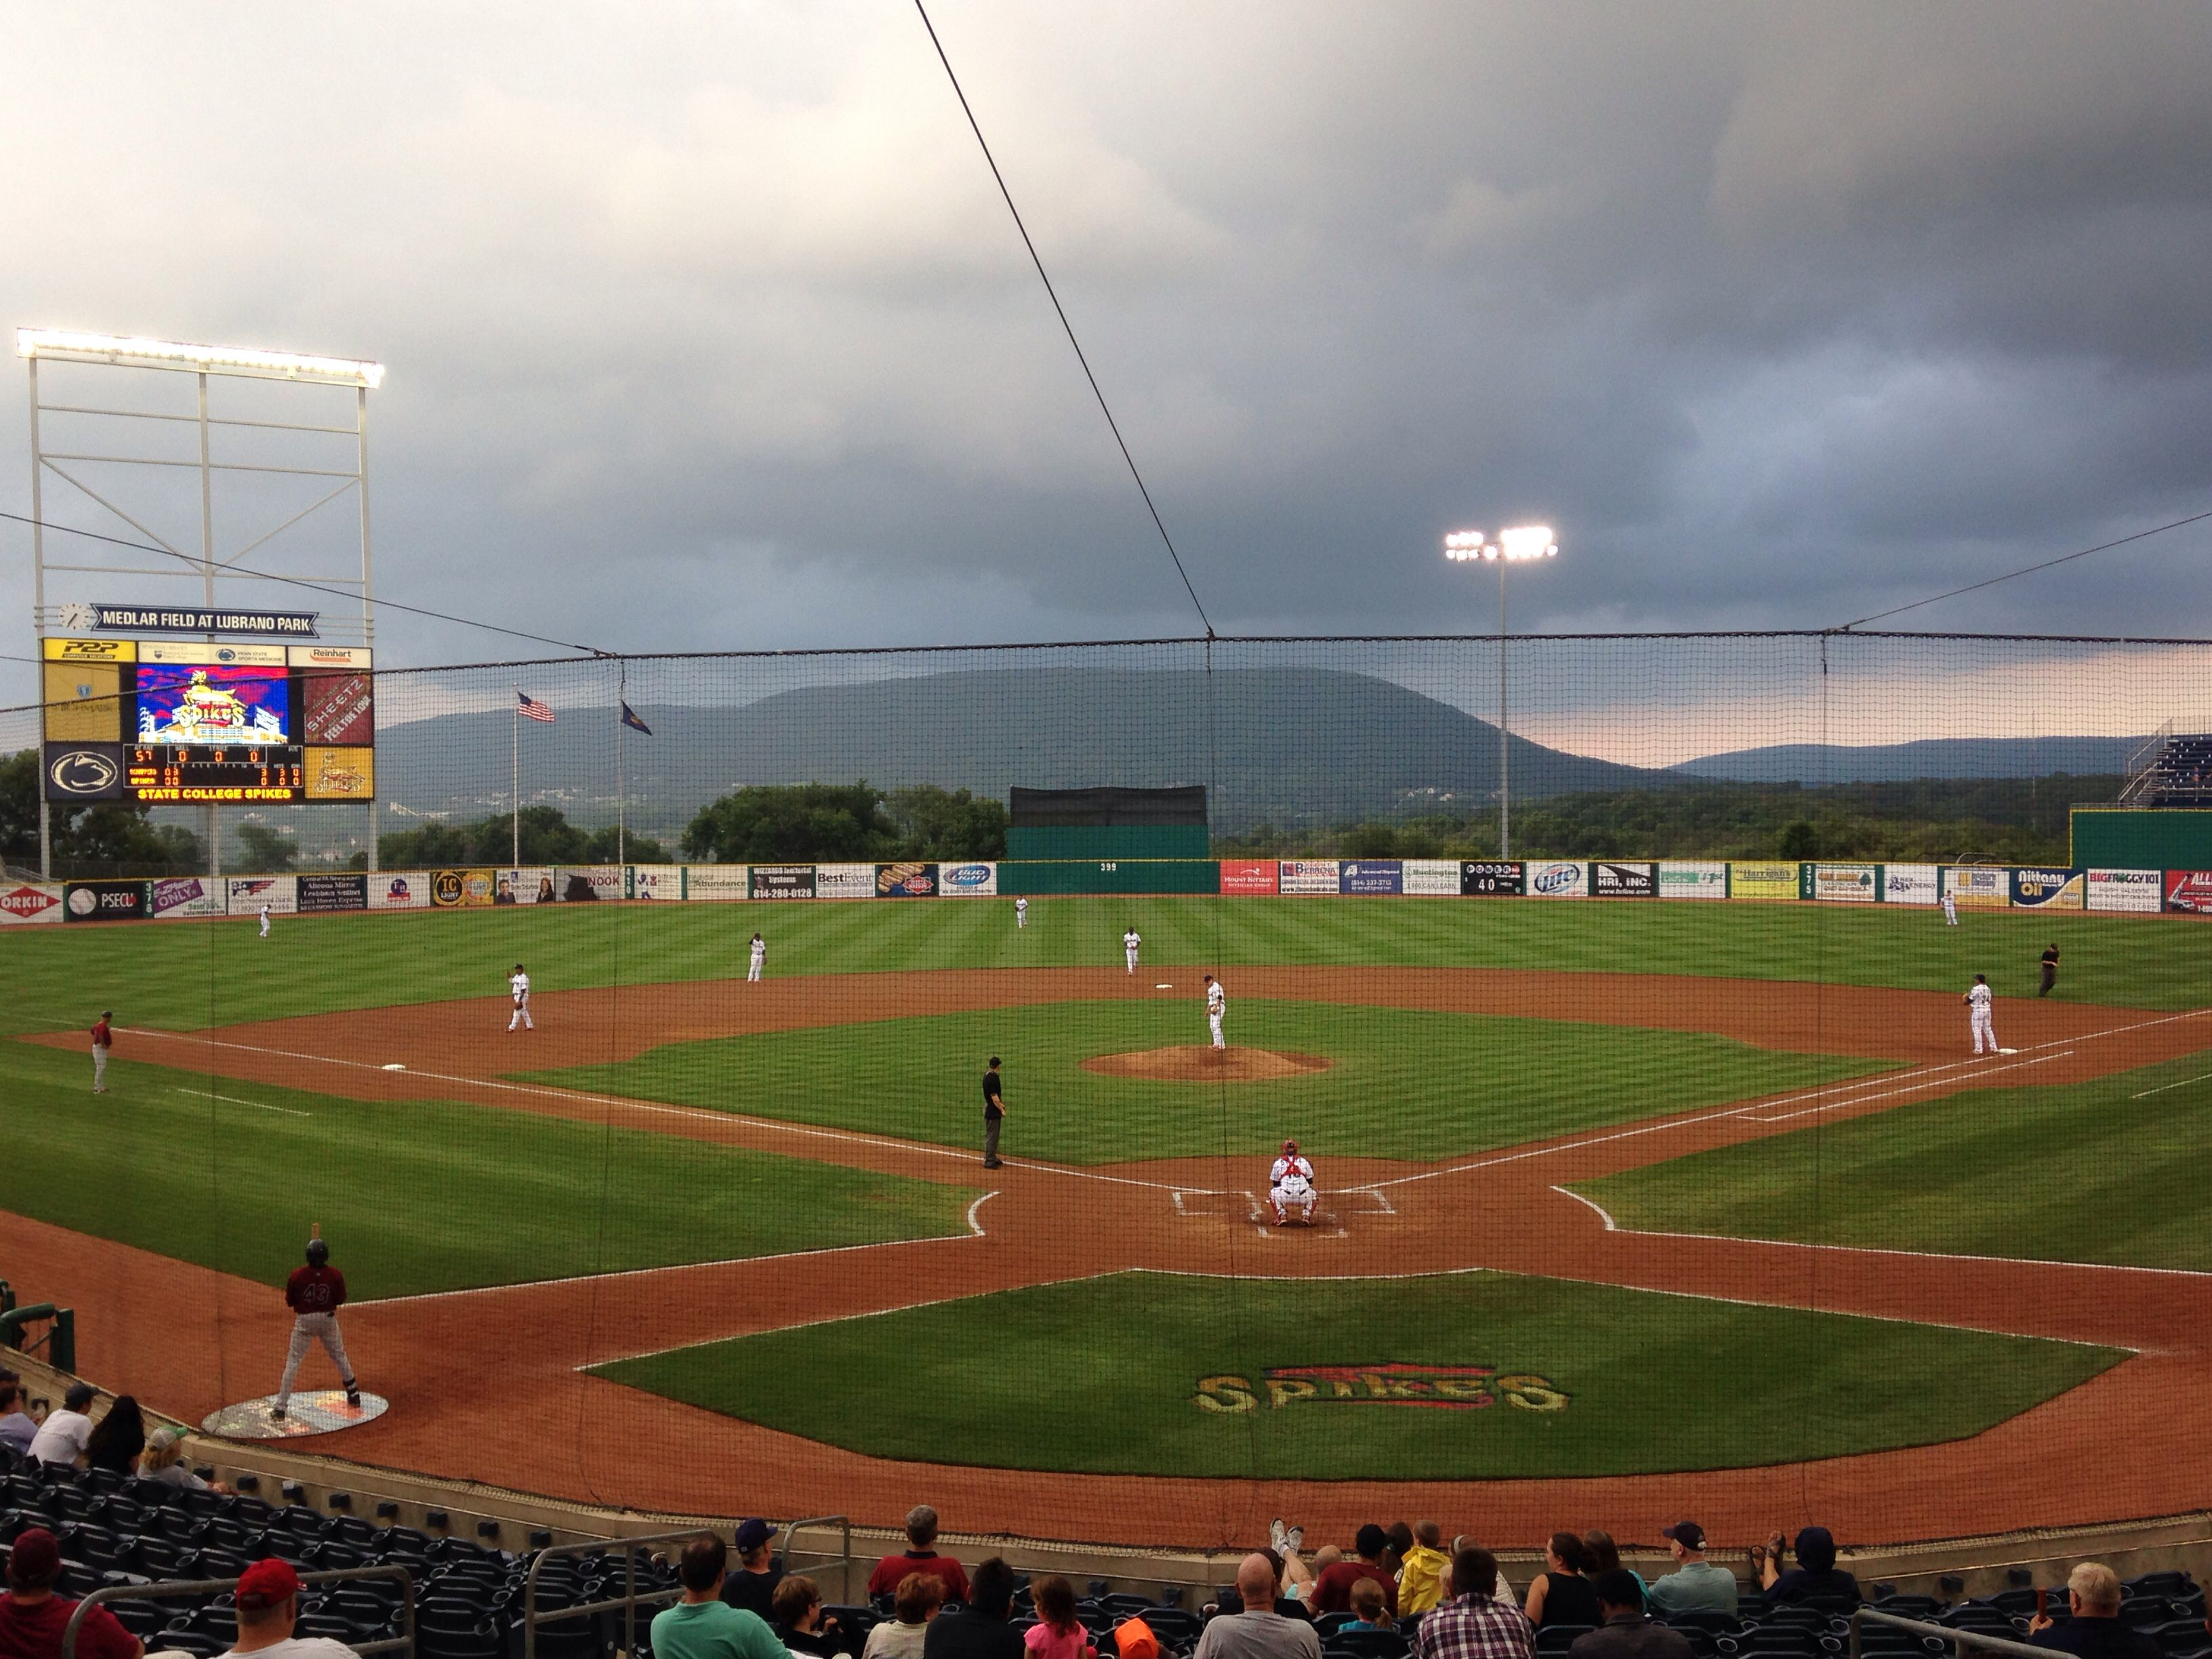 Medlar Field State College Spikes Baseball Stadium Minor League Baseball Great Night